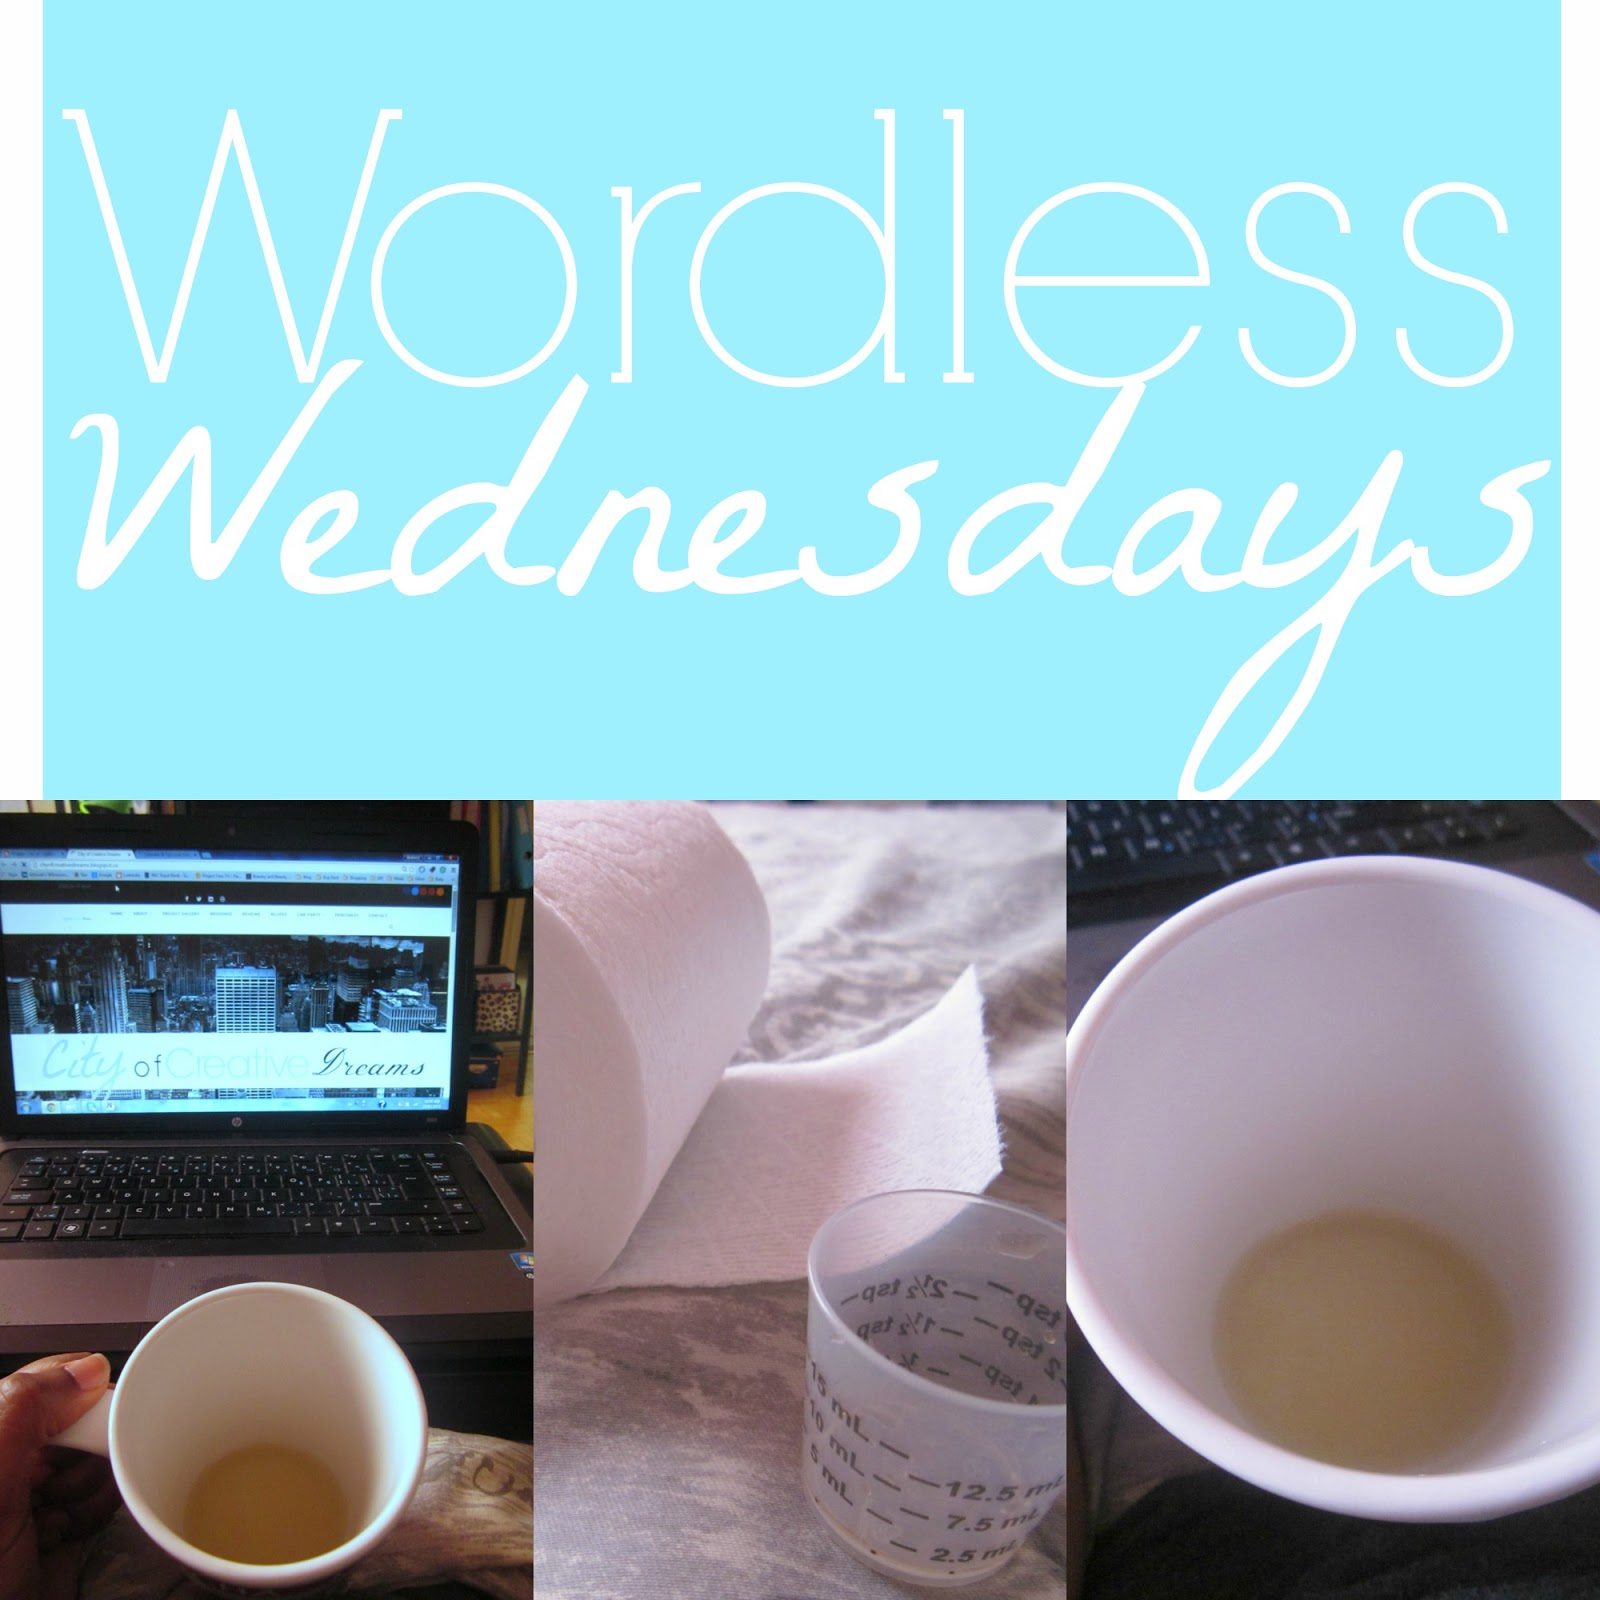 wordless wednesdays